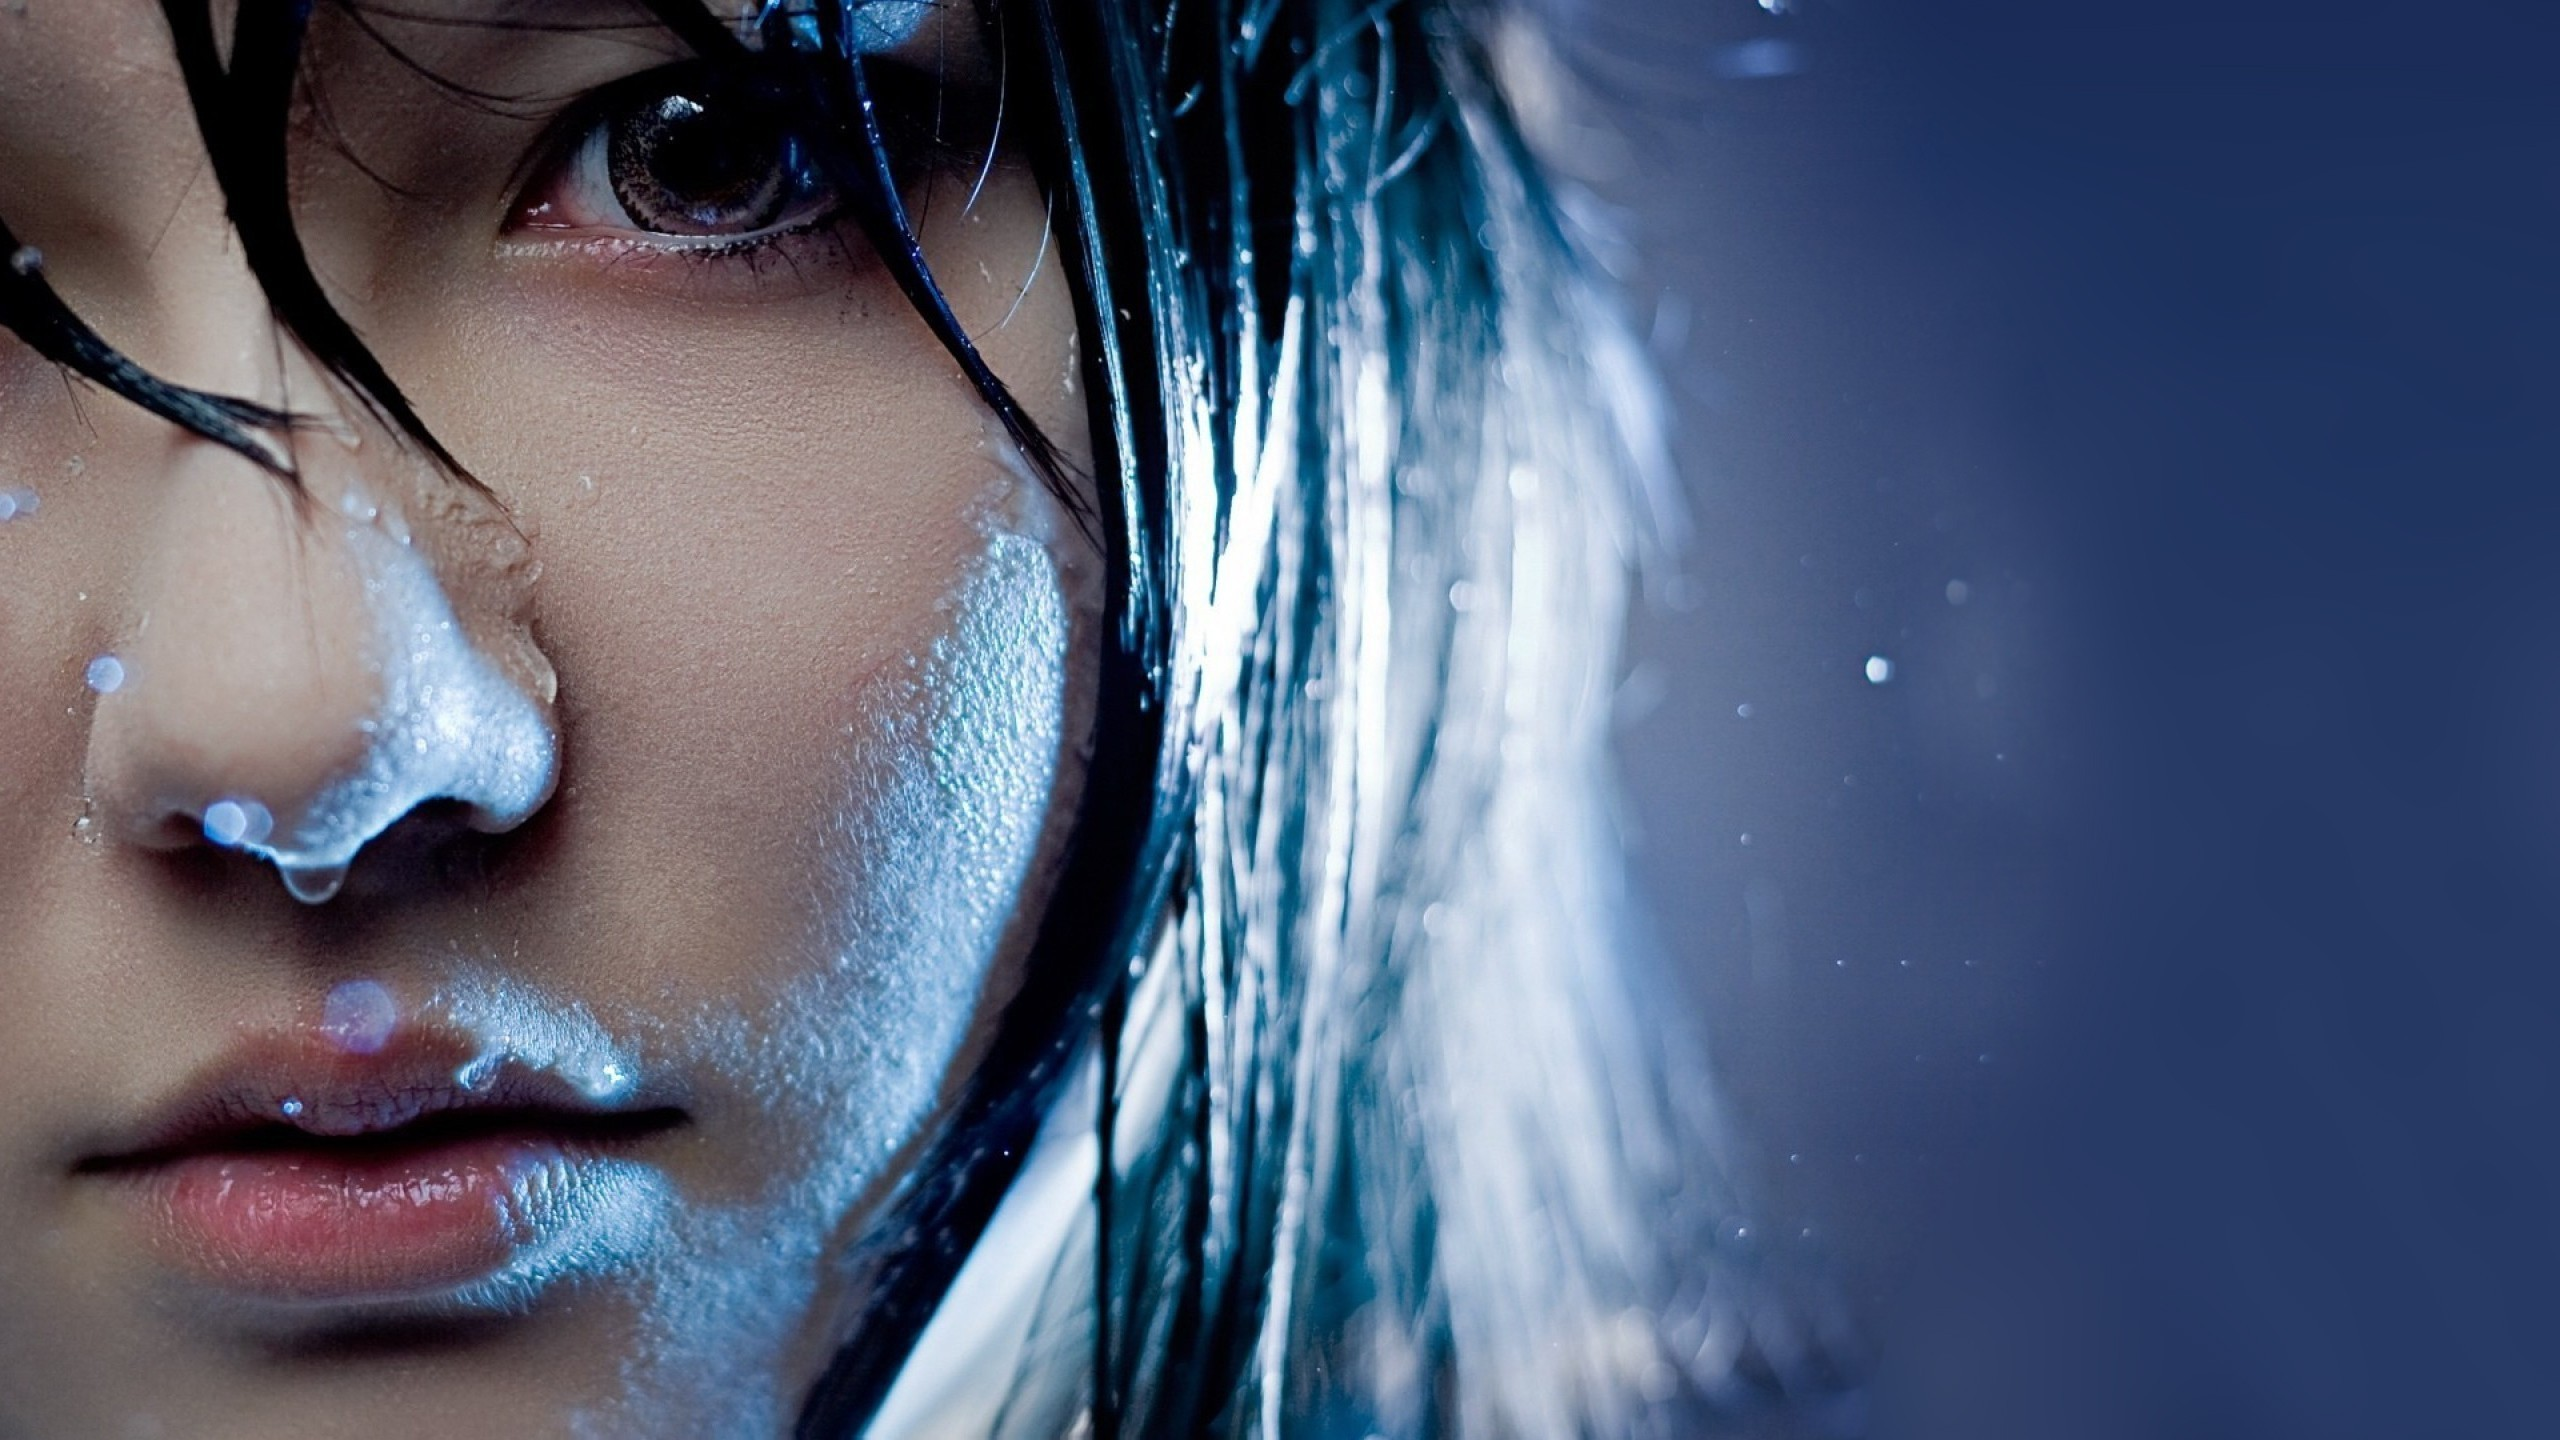 Wallpaper girl, face, hair, water, eyes, close-up